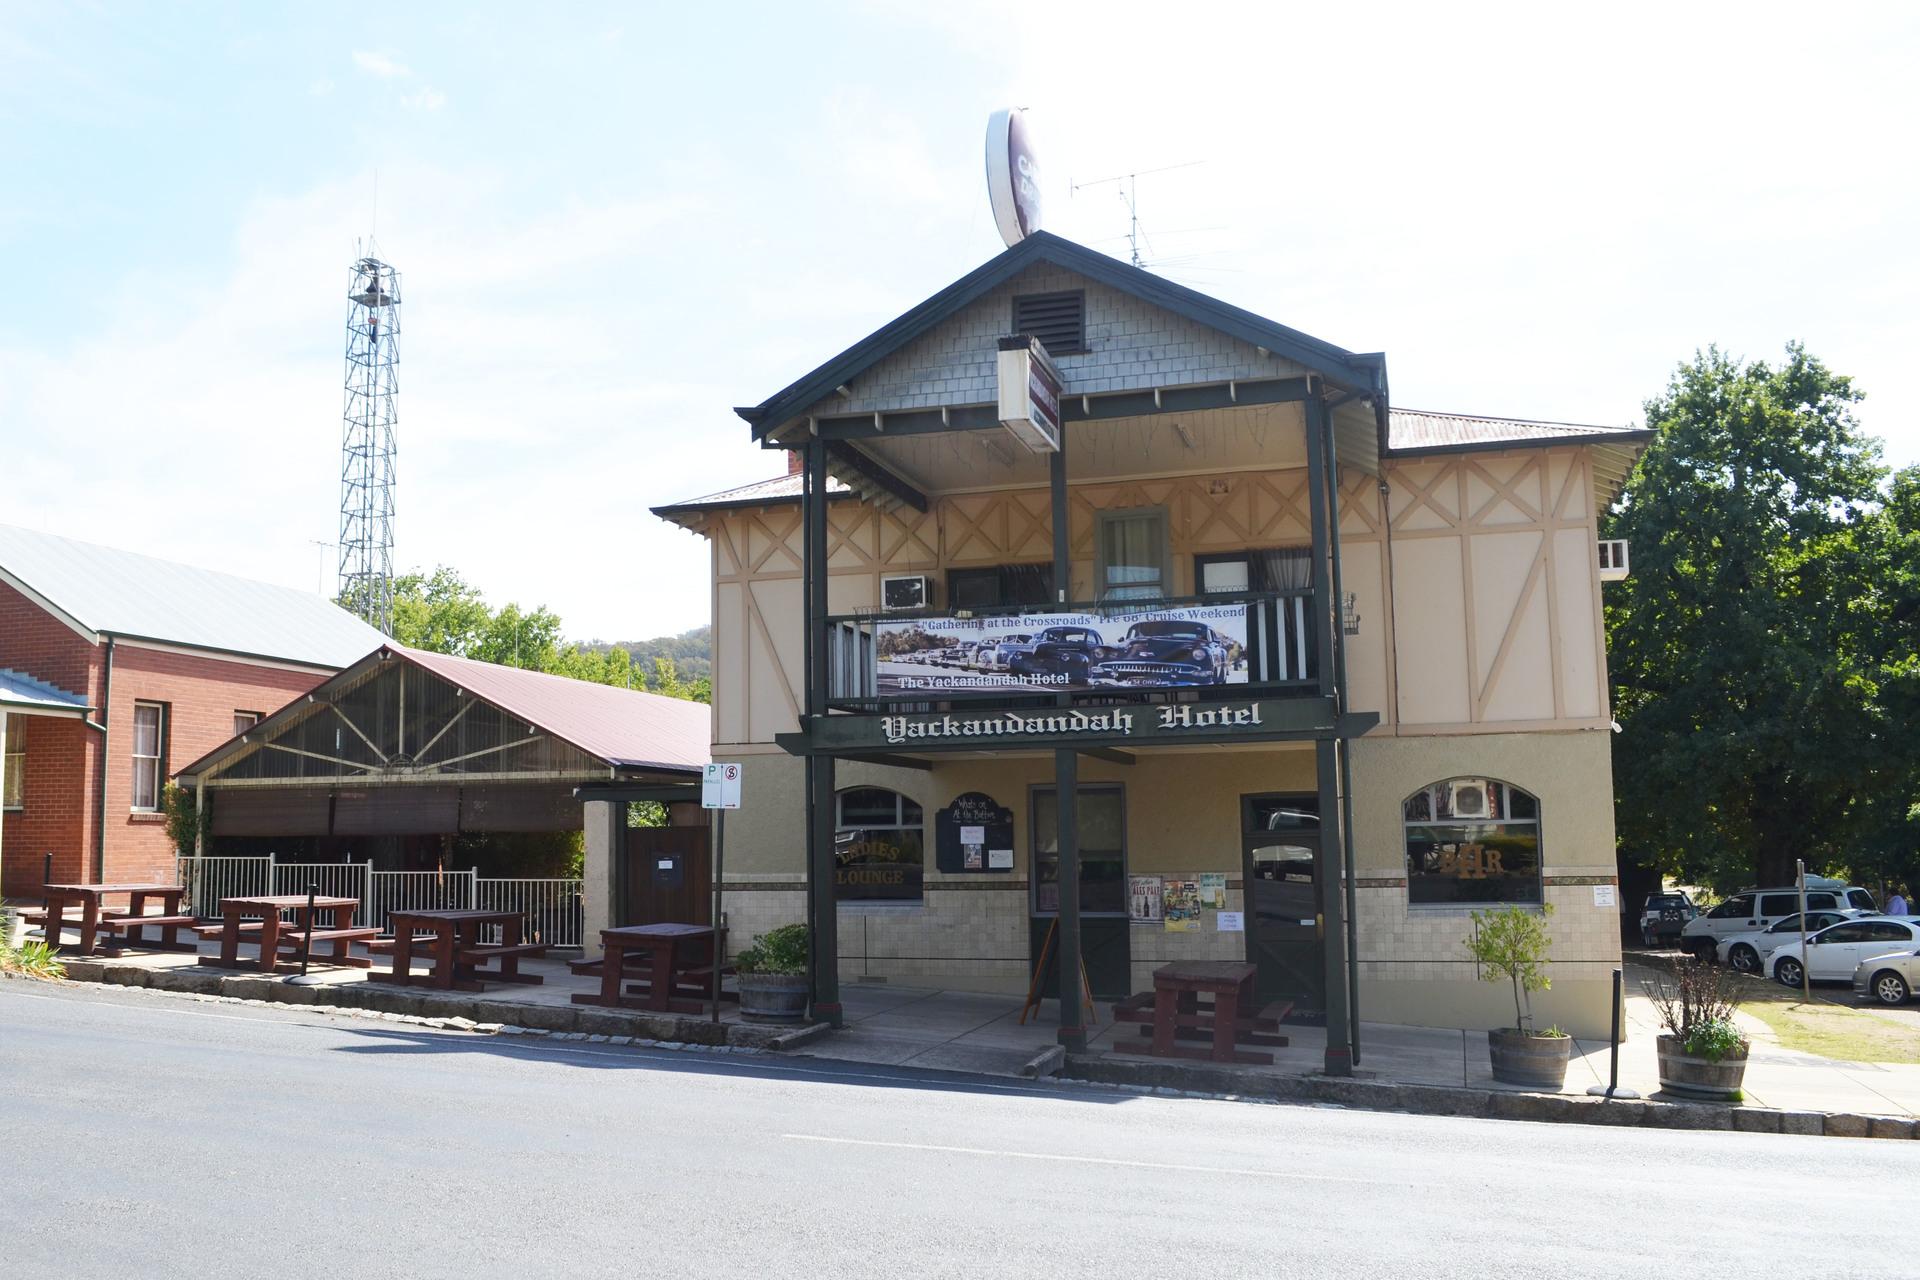 i - Yackandandah Hotel